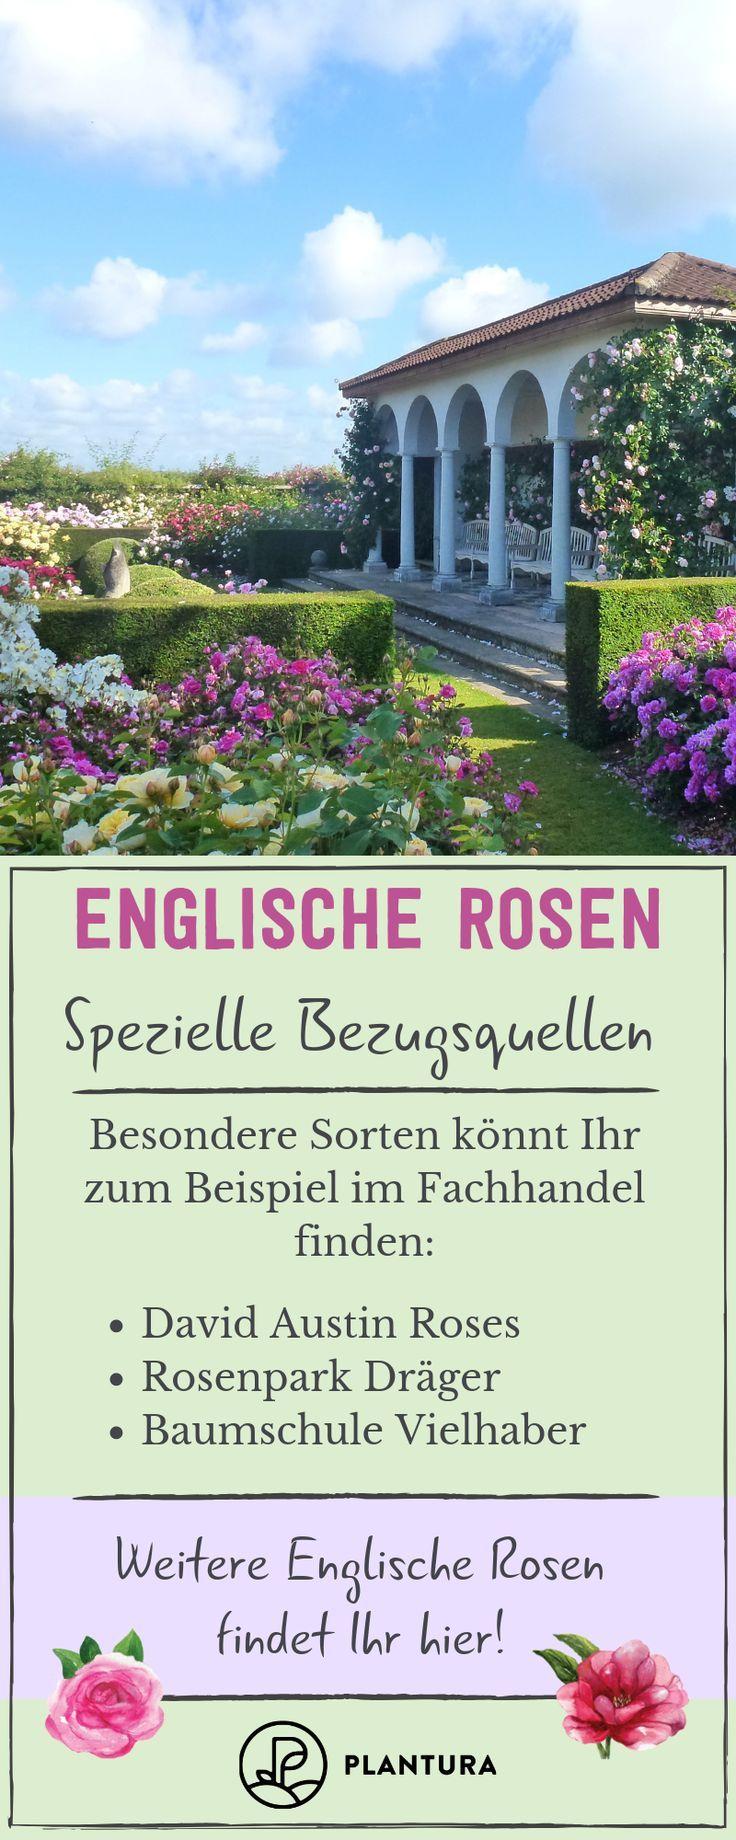 Englische Rosen Die 15 Beliebtesten Schonsten Sorten Beliebtesten Die Englische Rosen Schonsten Sorten In 2020 Rosensorten Garten Rosen